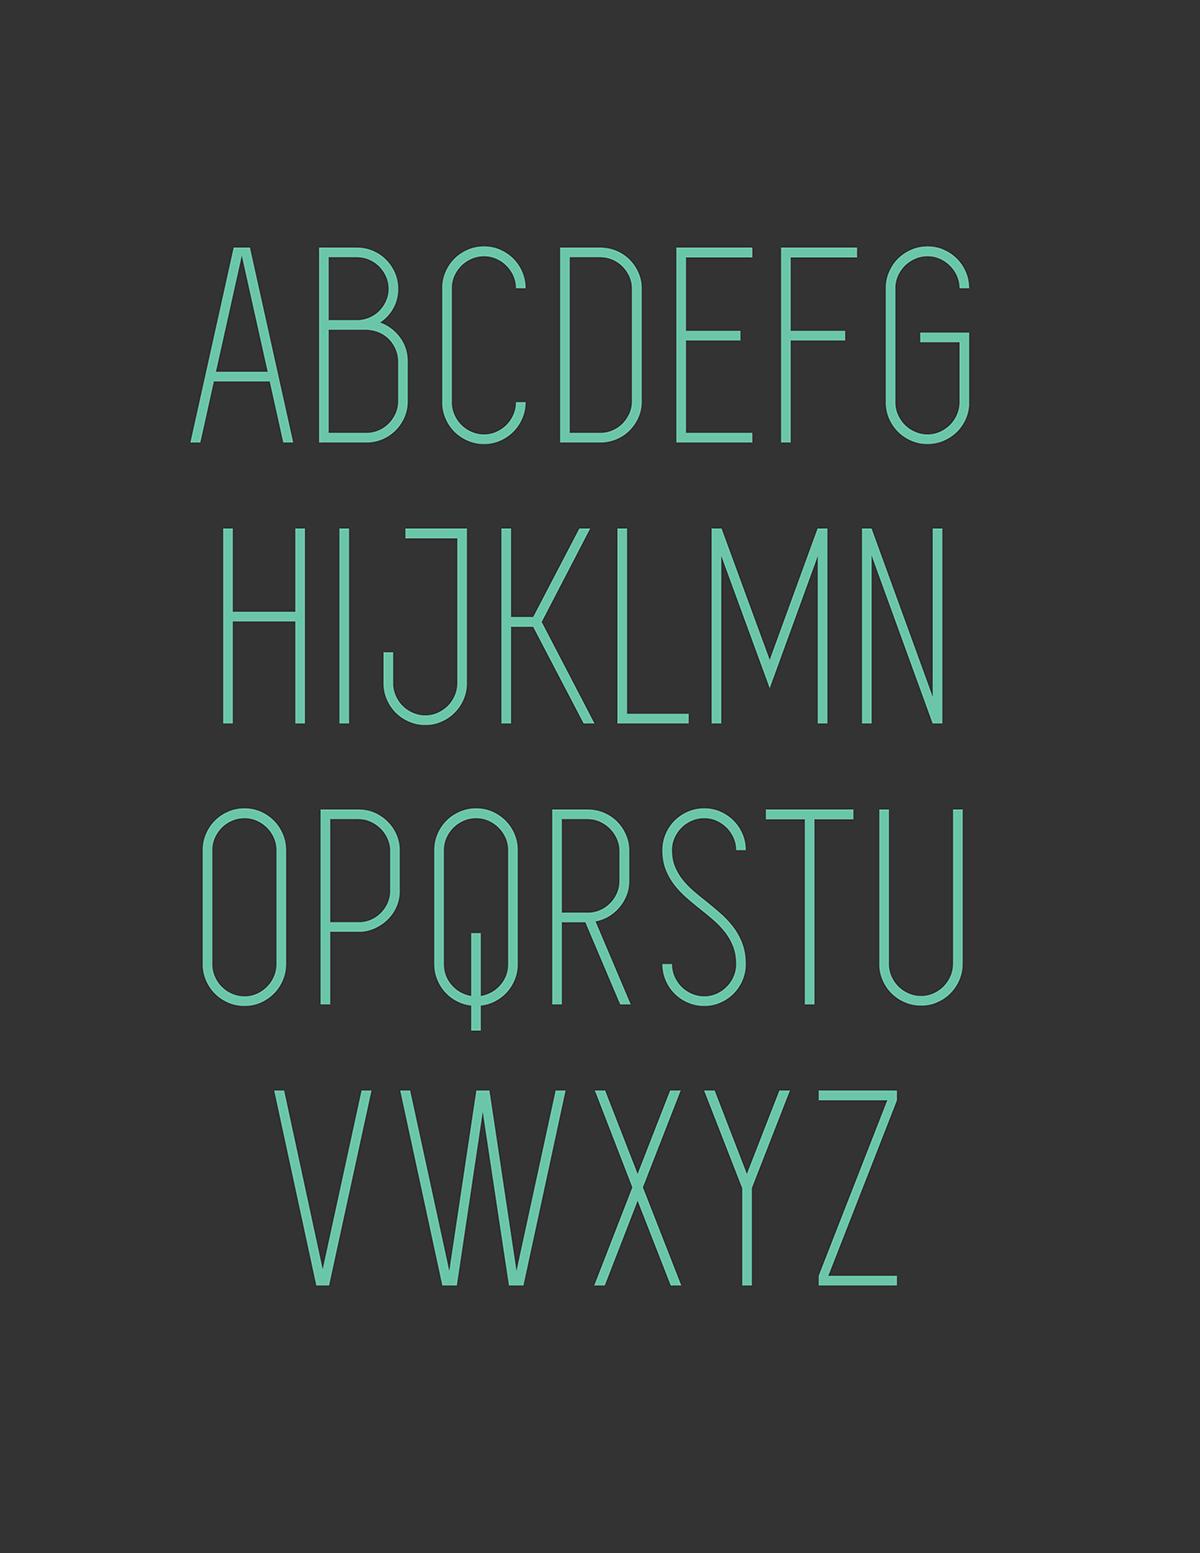 free font  simplifica  u203a freetypography